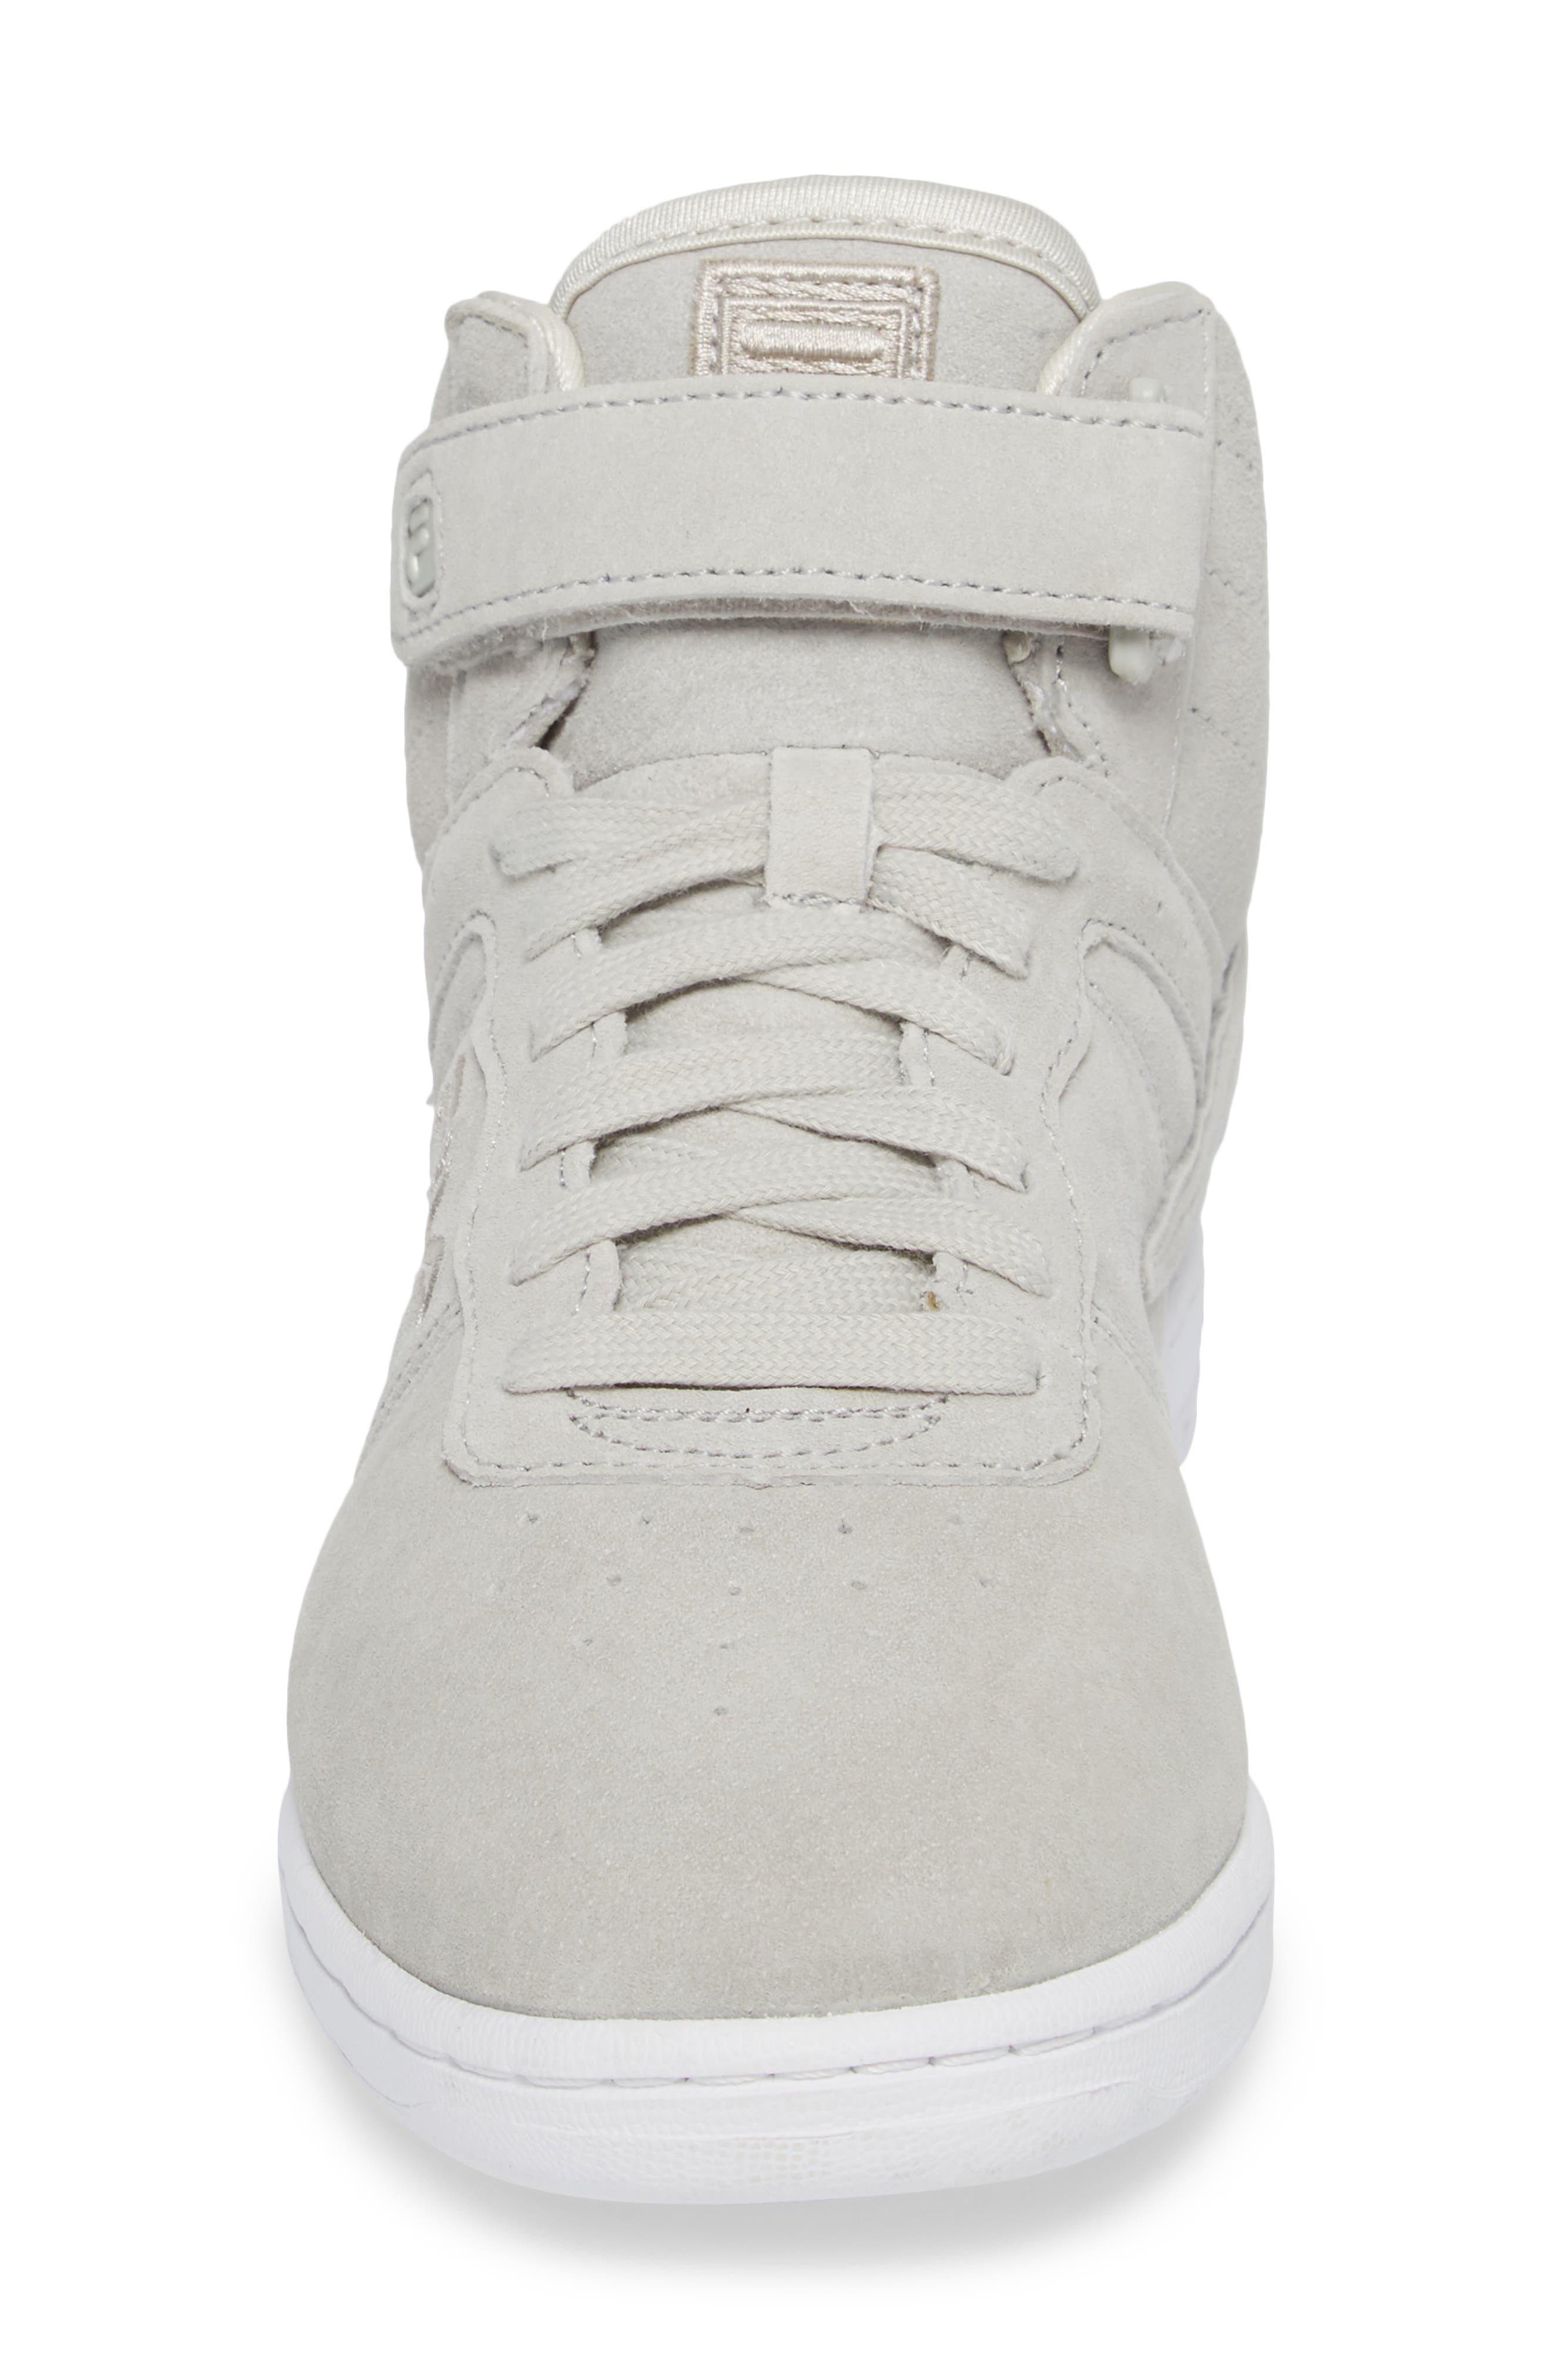 F-13 Premium Mid Top Sneaker,                             Alternate thumbnail 4, color,                             White